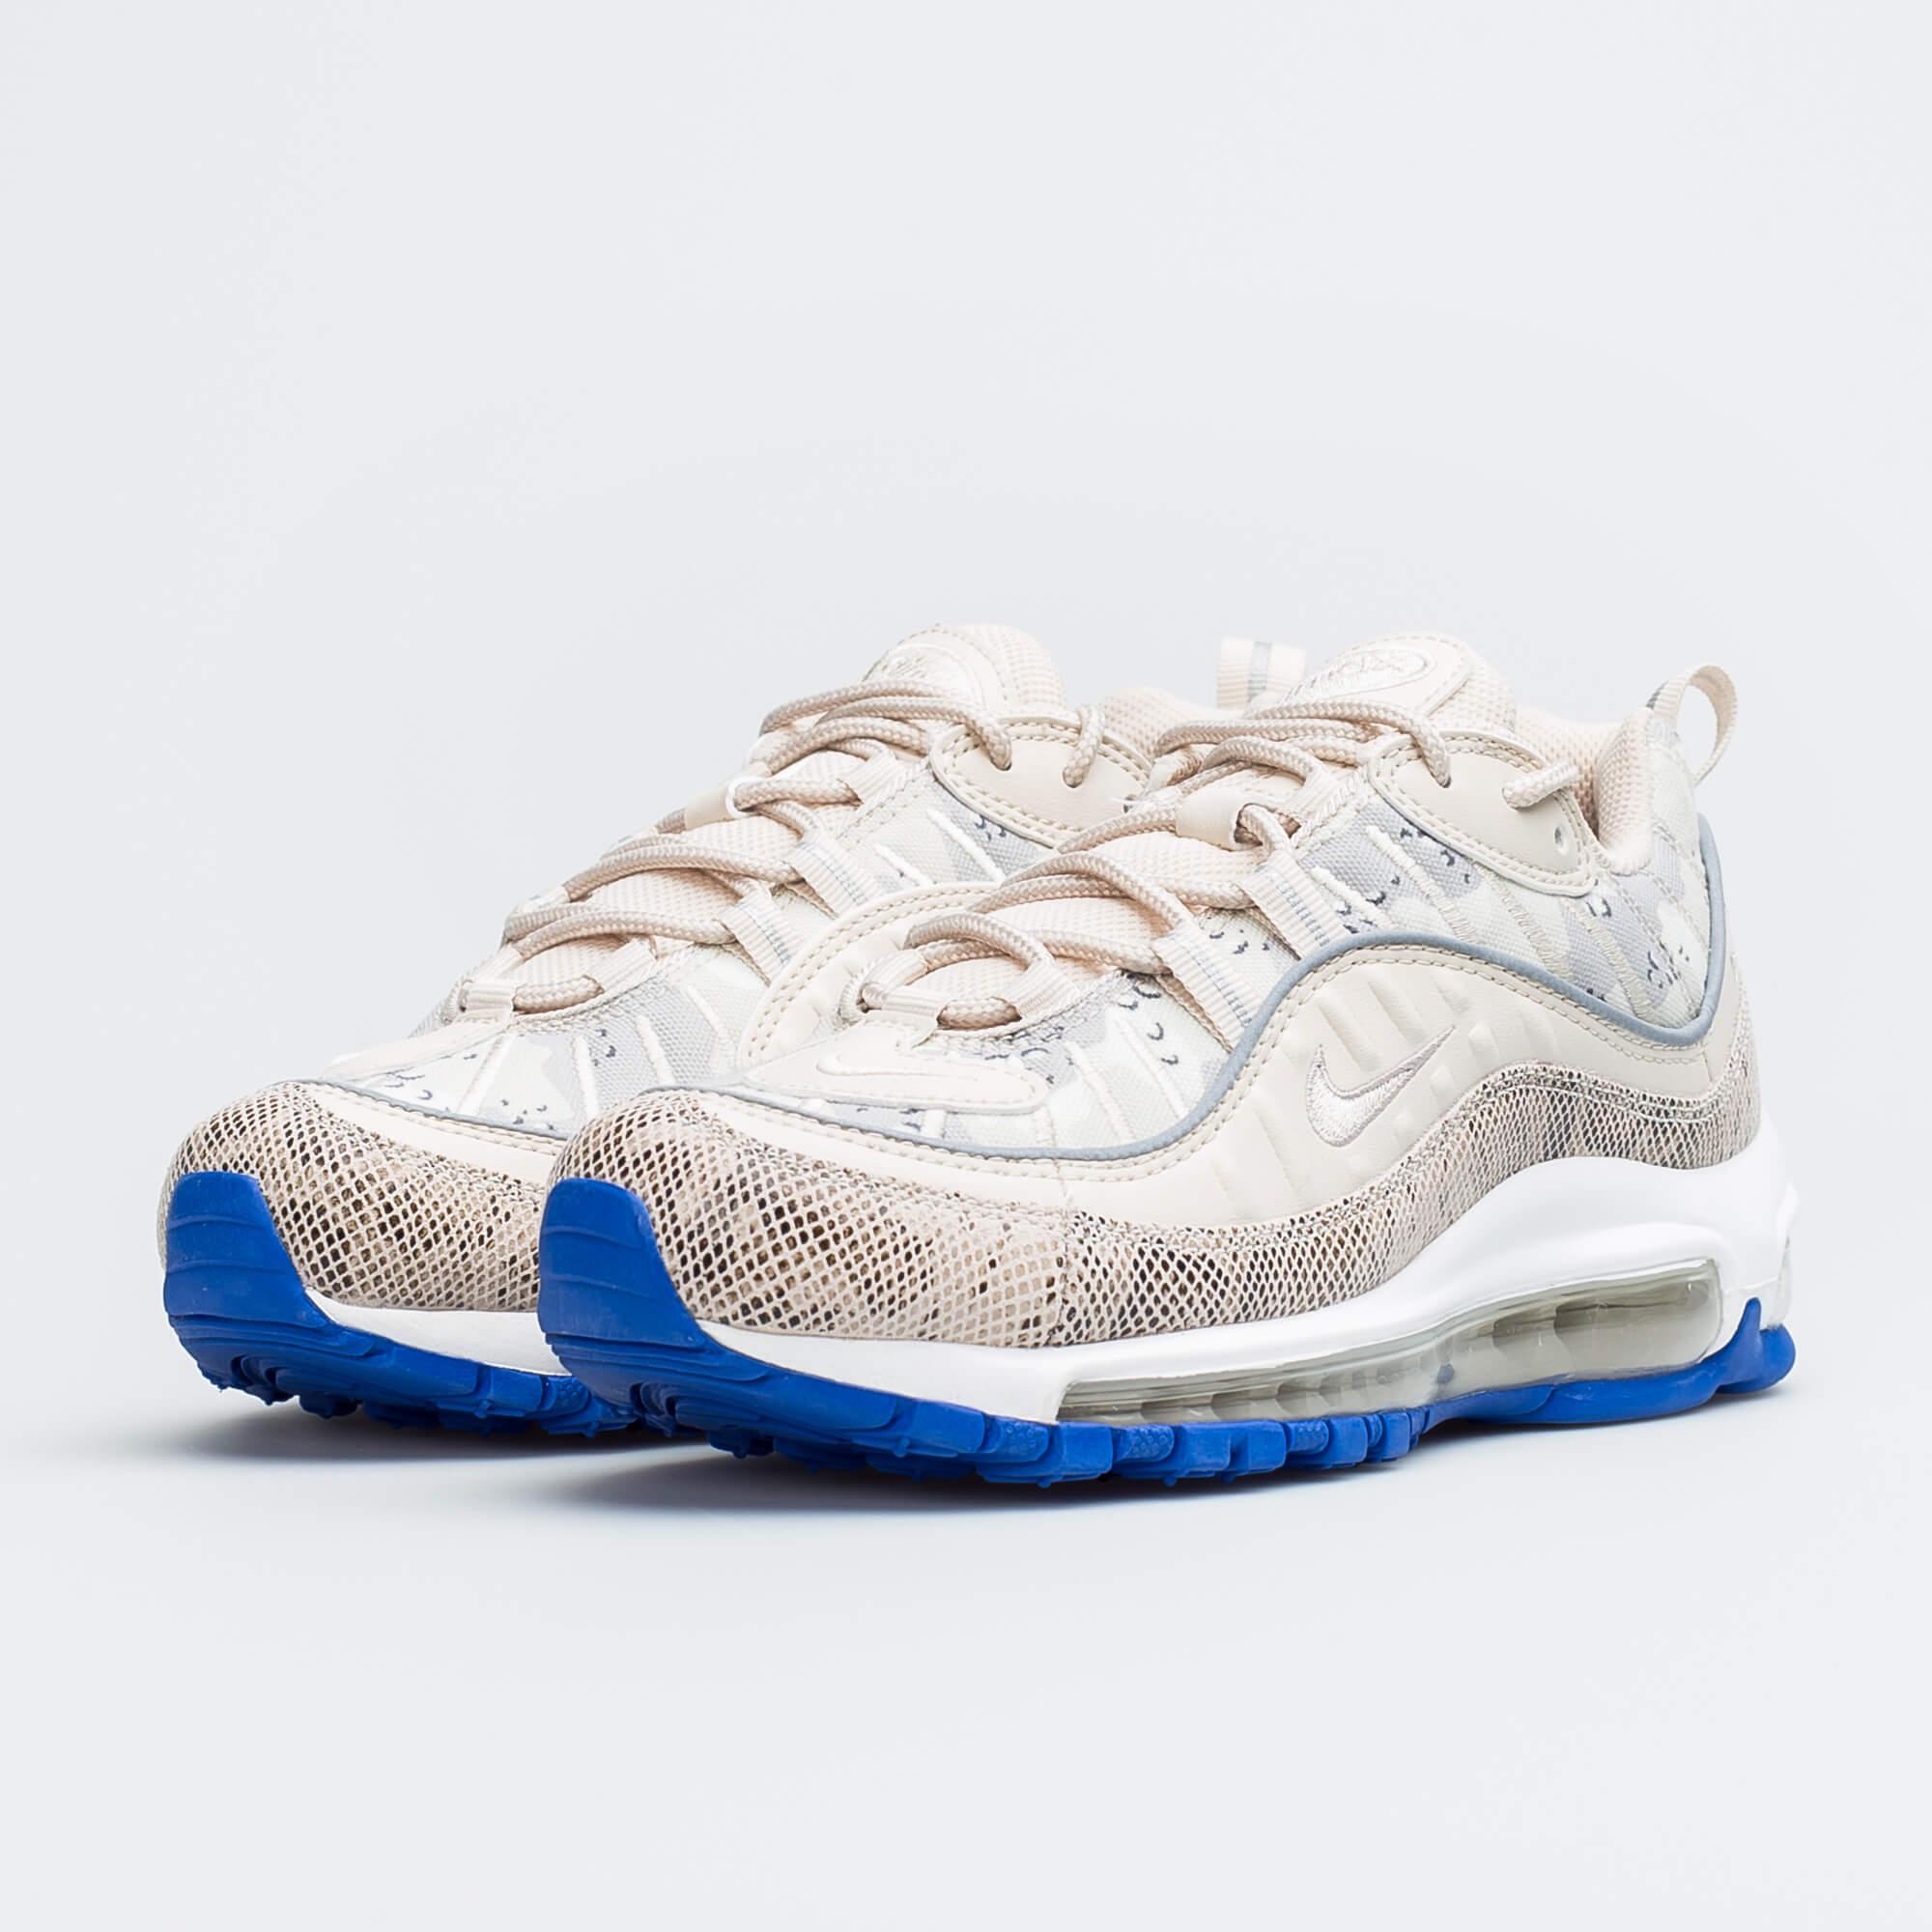 Nike Nike Air Max 98 PRM SNAKESKIN CAMO CI2672 100